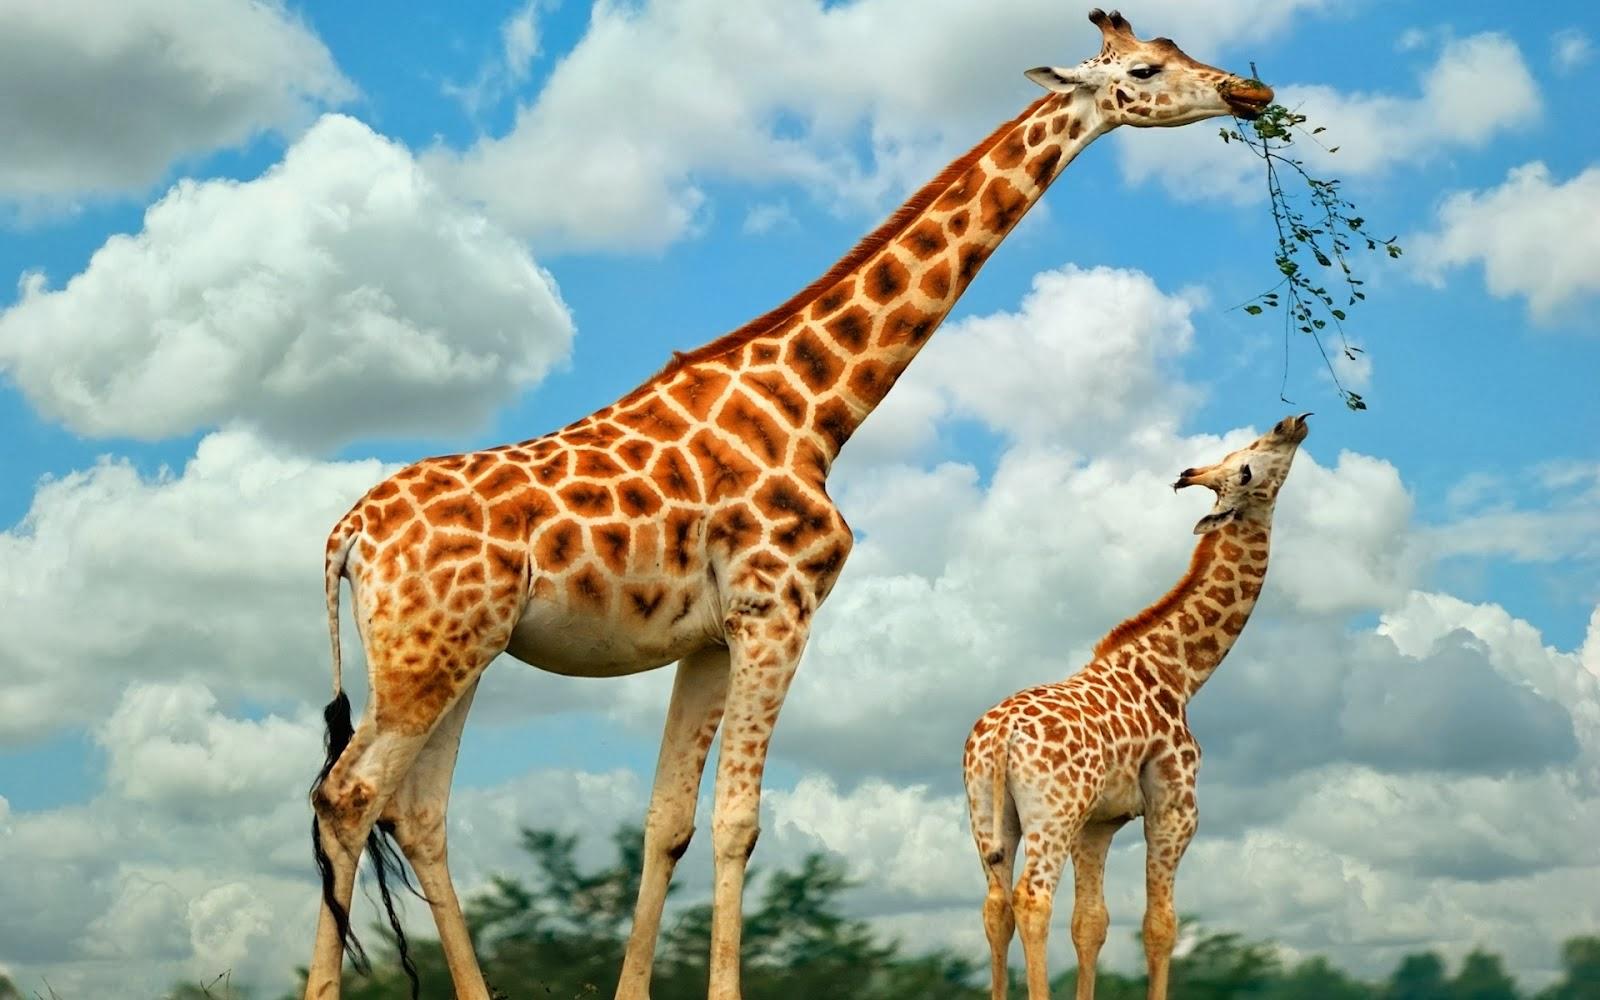 Giraffe Wallpapers ~ Free HD Desktop Wallpapers Download